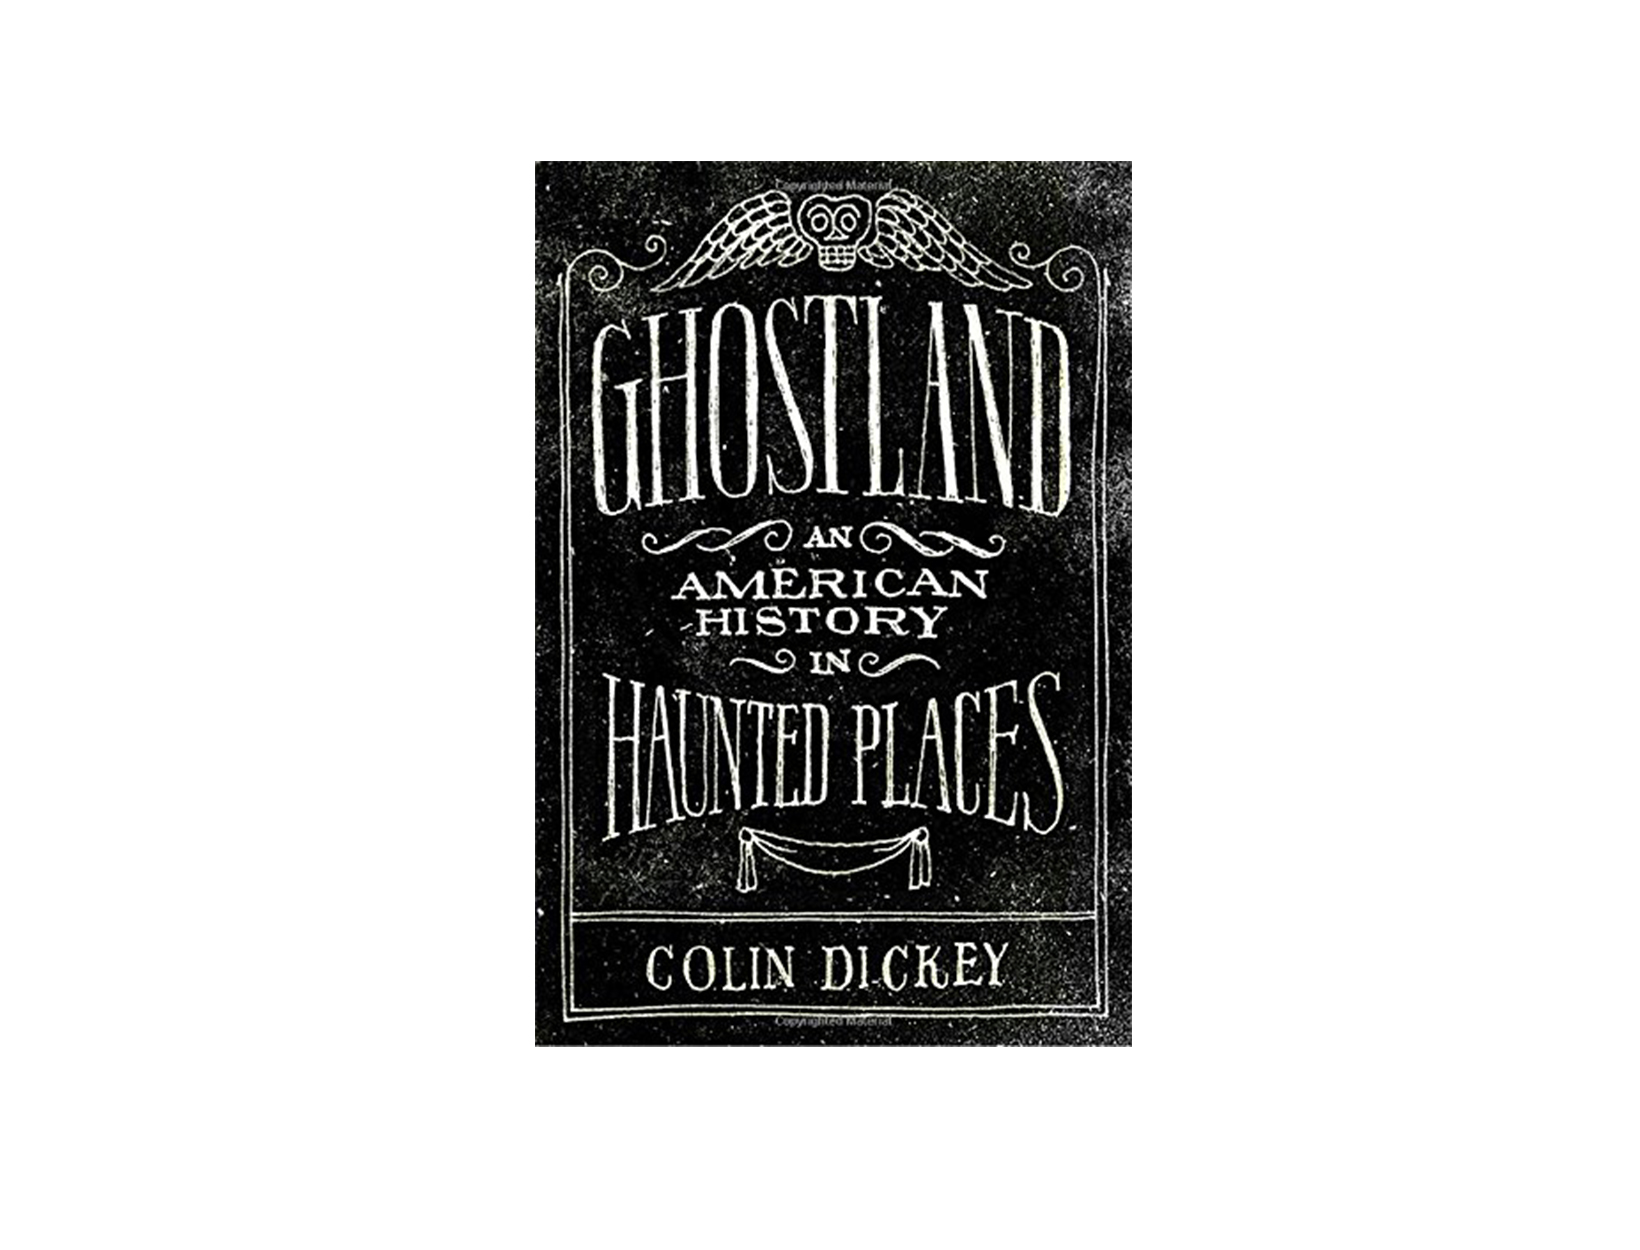 Ghostland by Colin Dickey